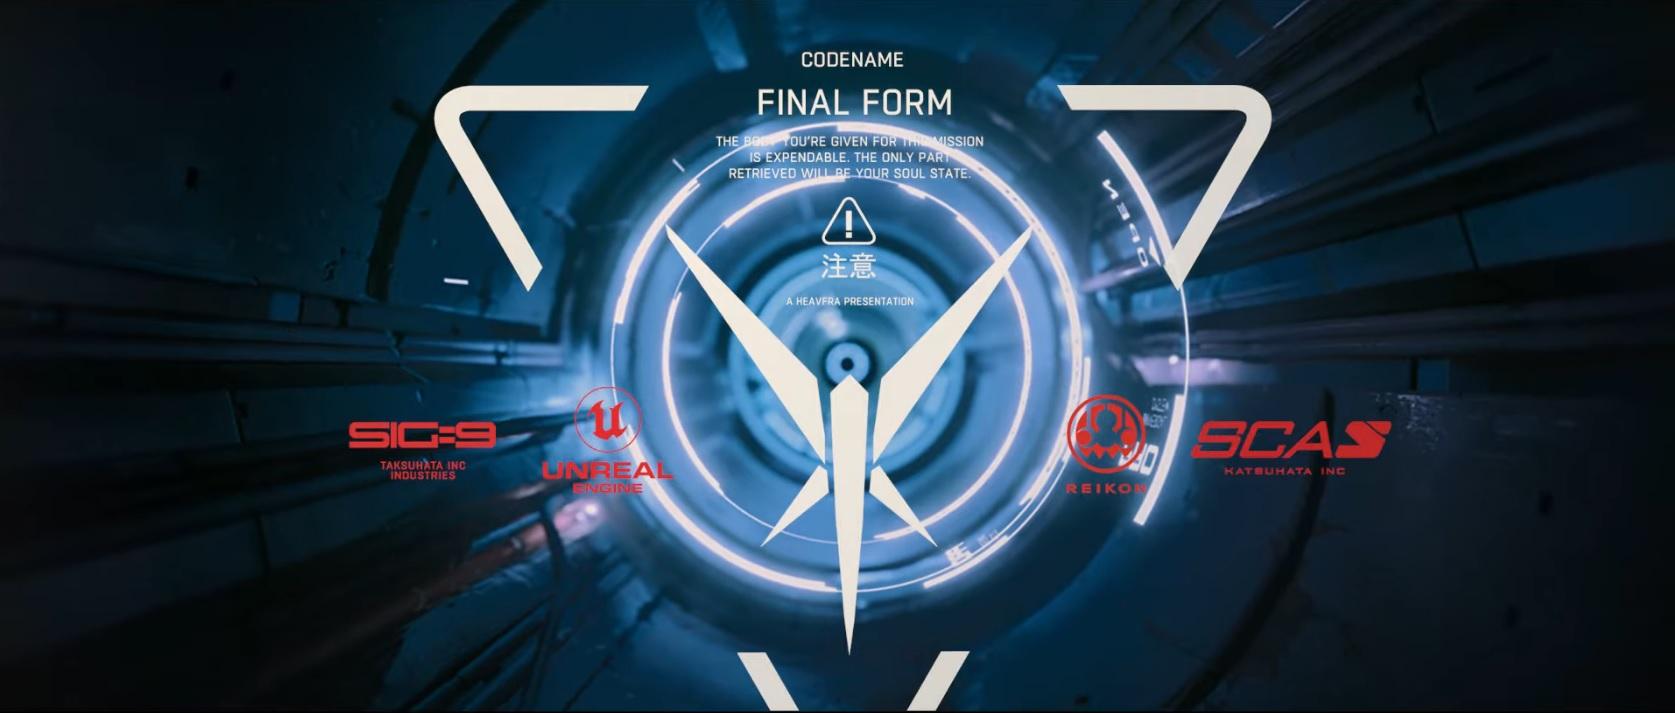 final-form